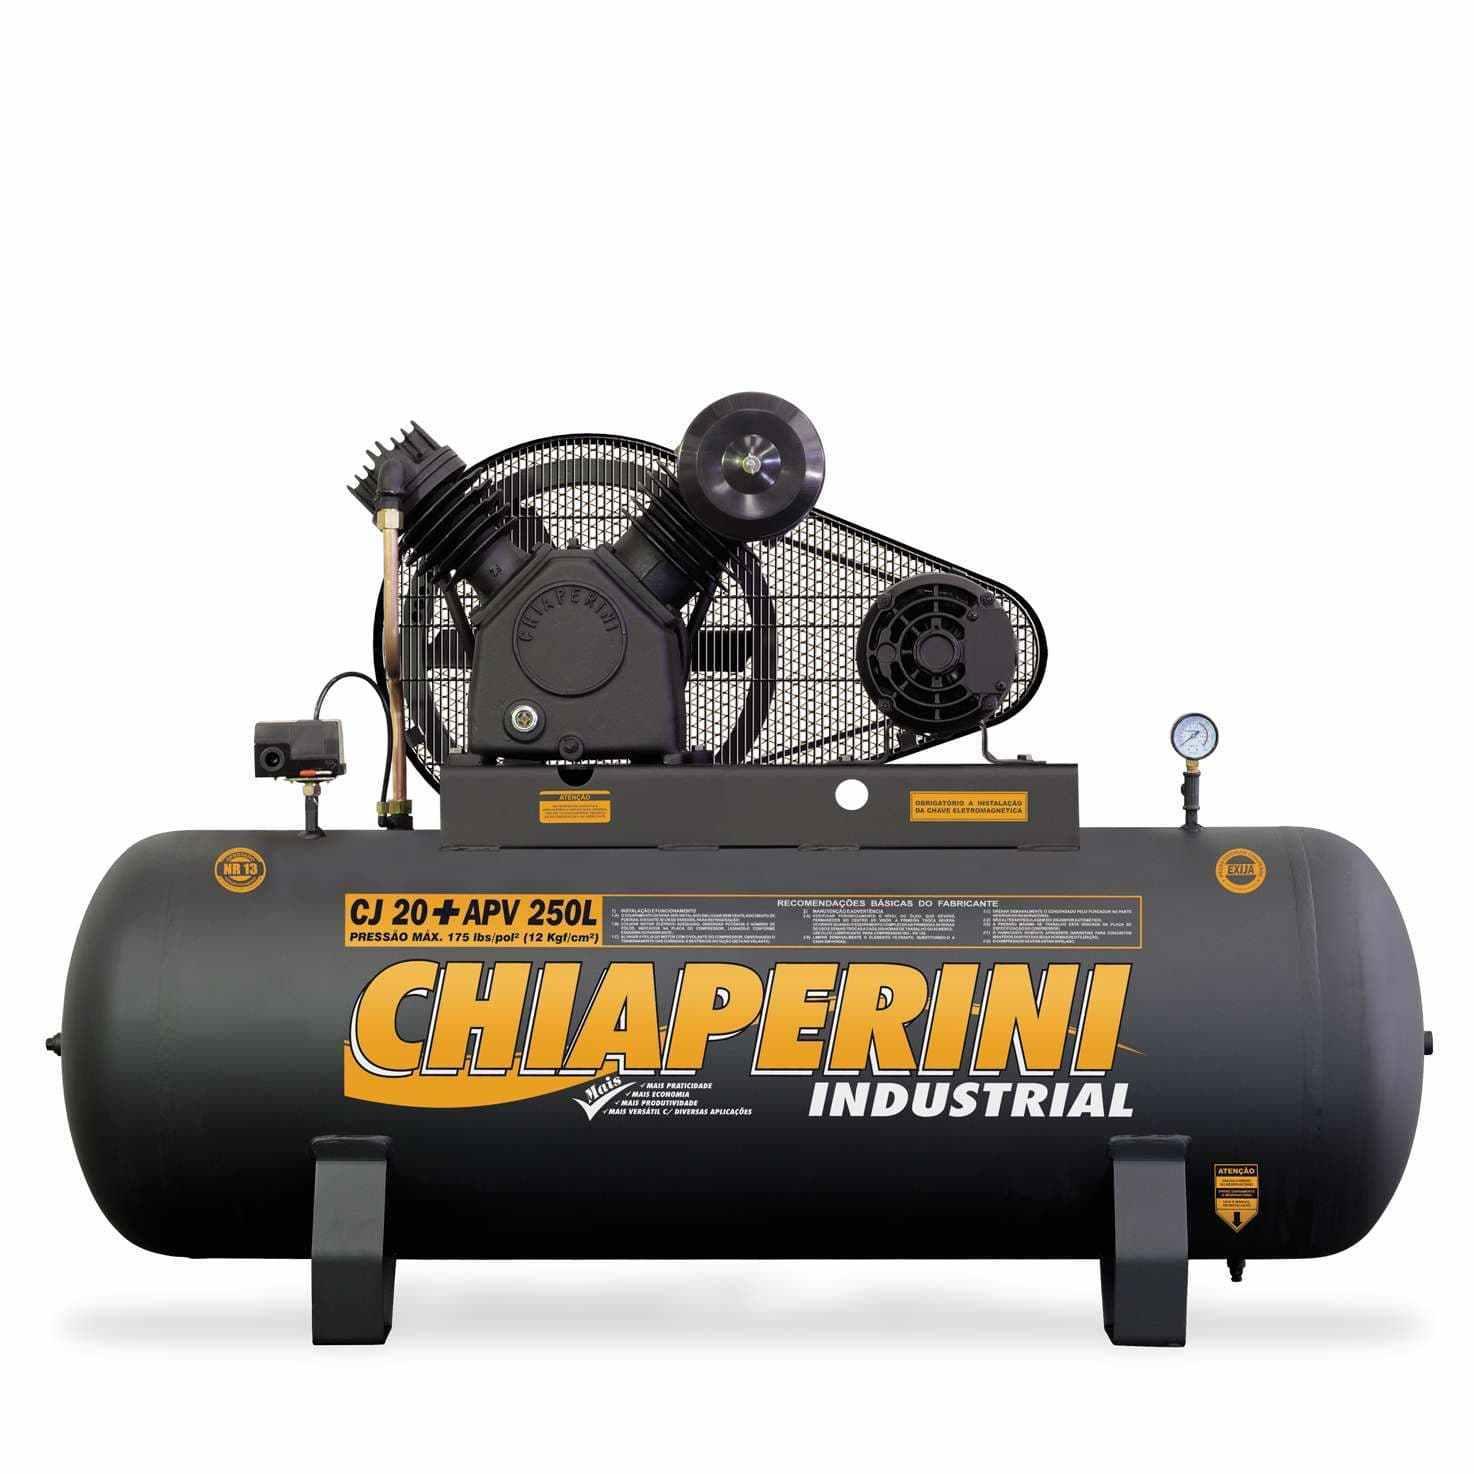 Compressor Trifásico 175psi 20pés 250L 5hp Chiaperini - CJ20 + APV 250L - COD:1080007-1